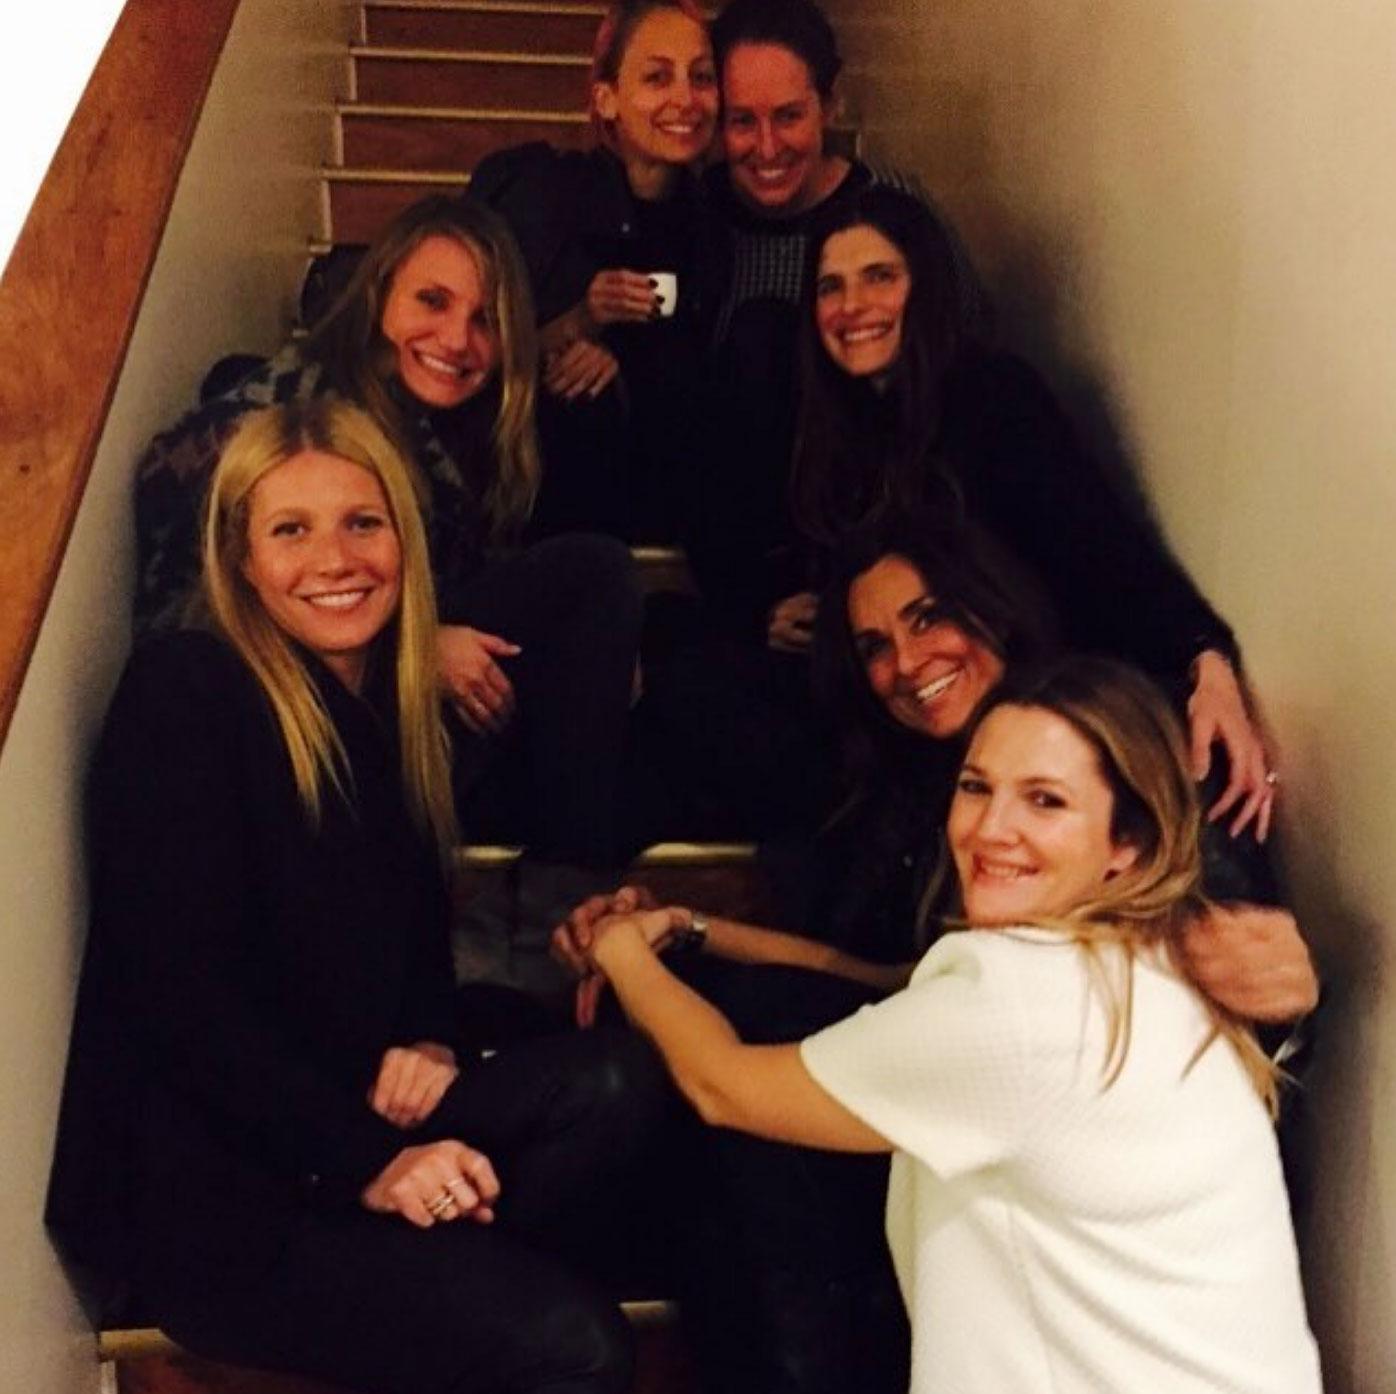 oscars 2019 Drew Barrymore Celebrates 44th Birthday With Gwyneth Paltrow and Cameron Diaz - Nicole Richie, Cameron Diaz, Gwyneth Paltrow, and Drew Barrymore